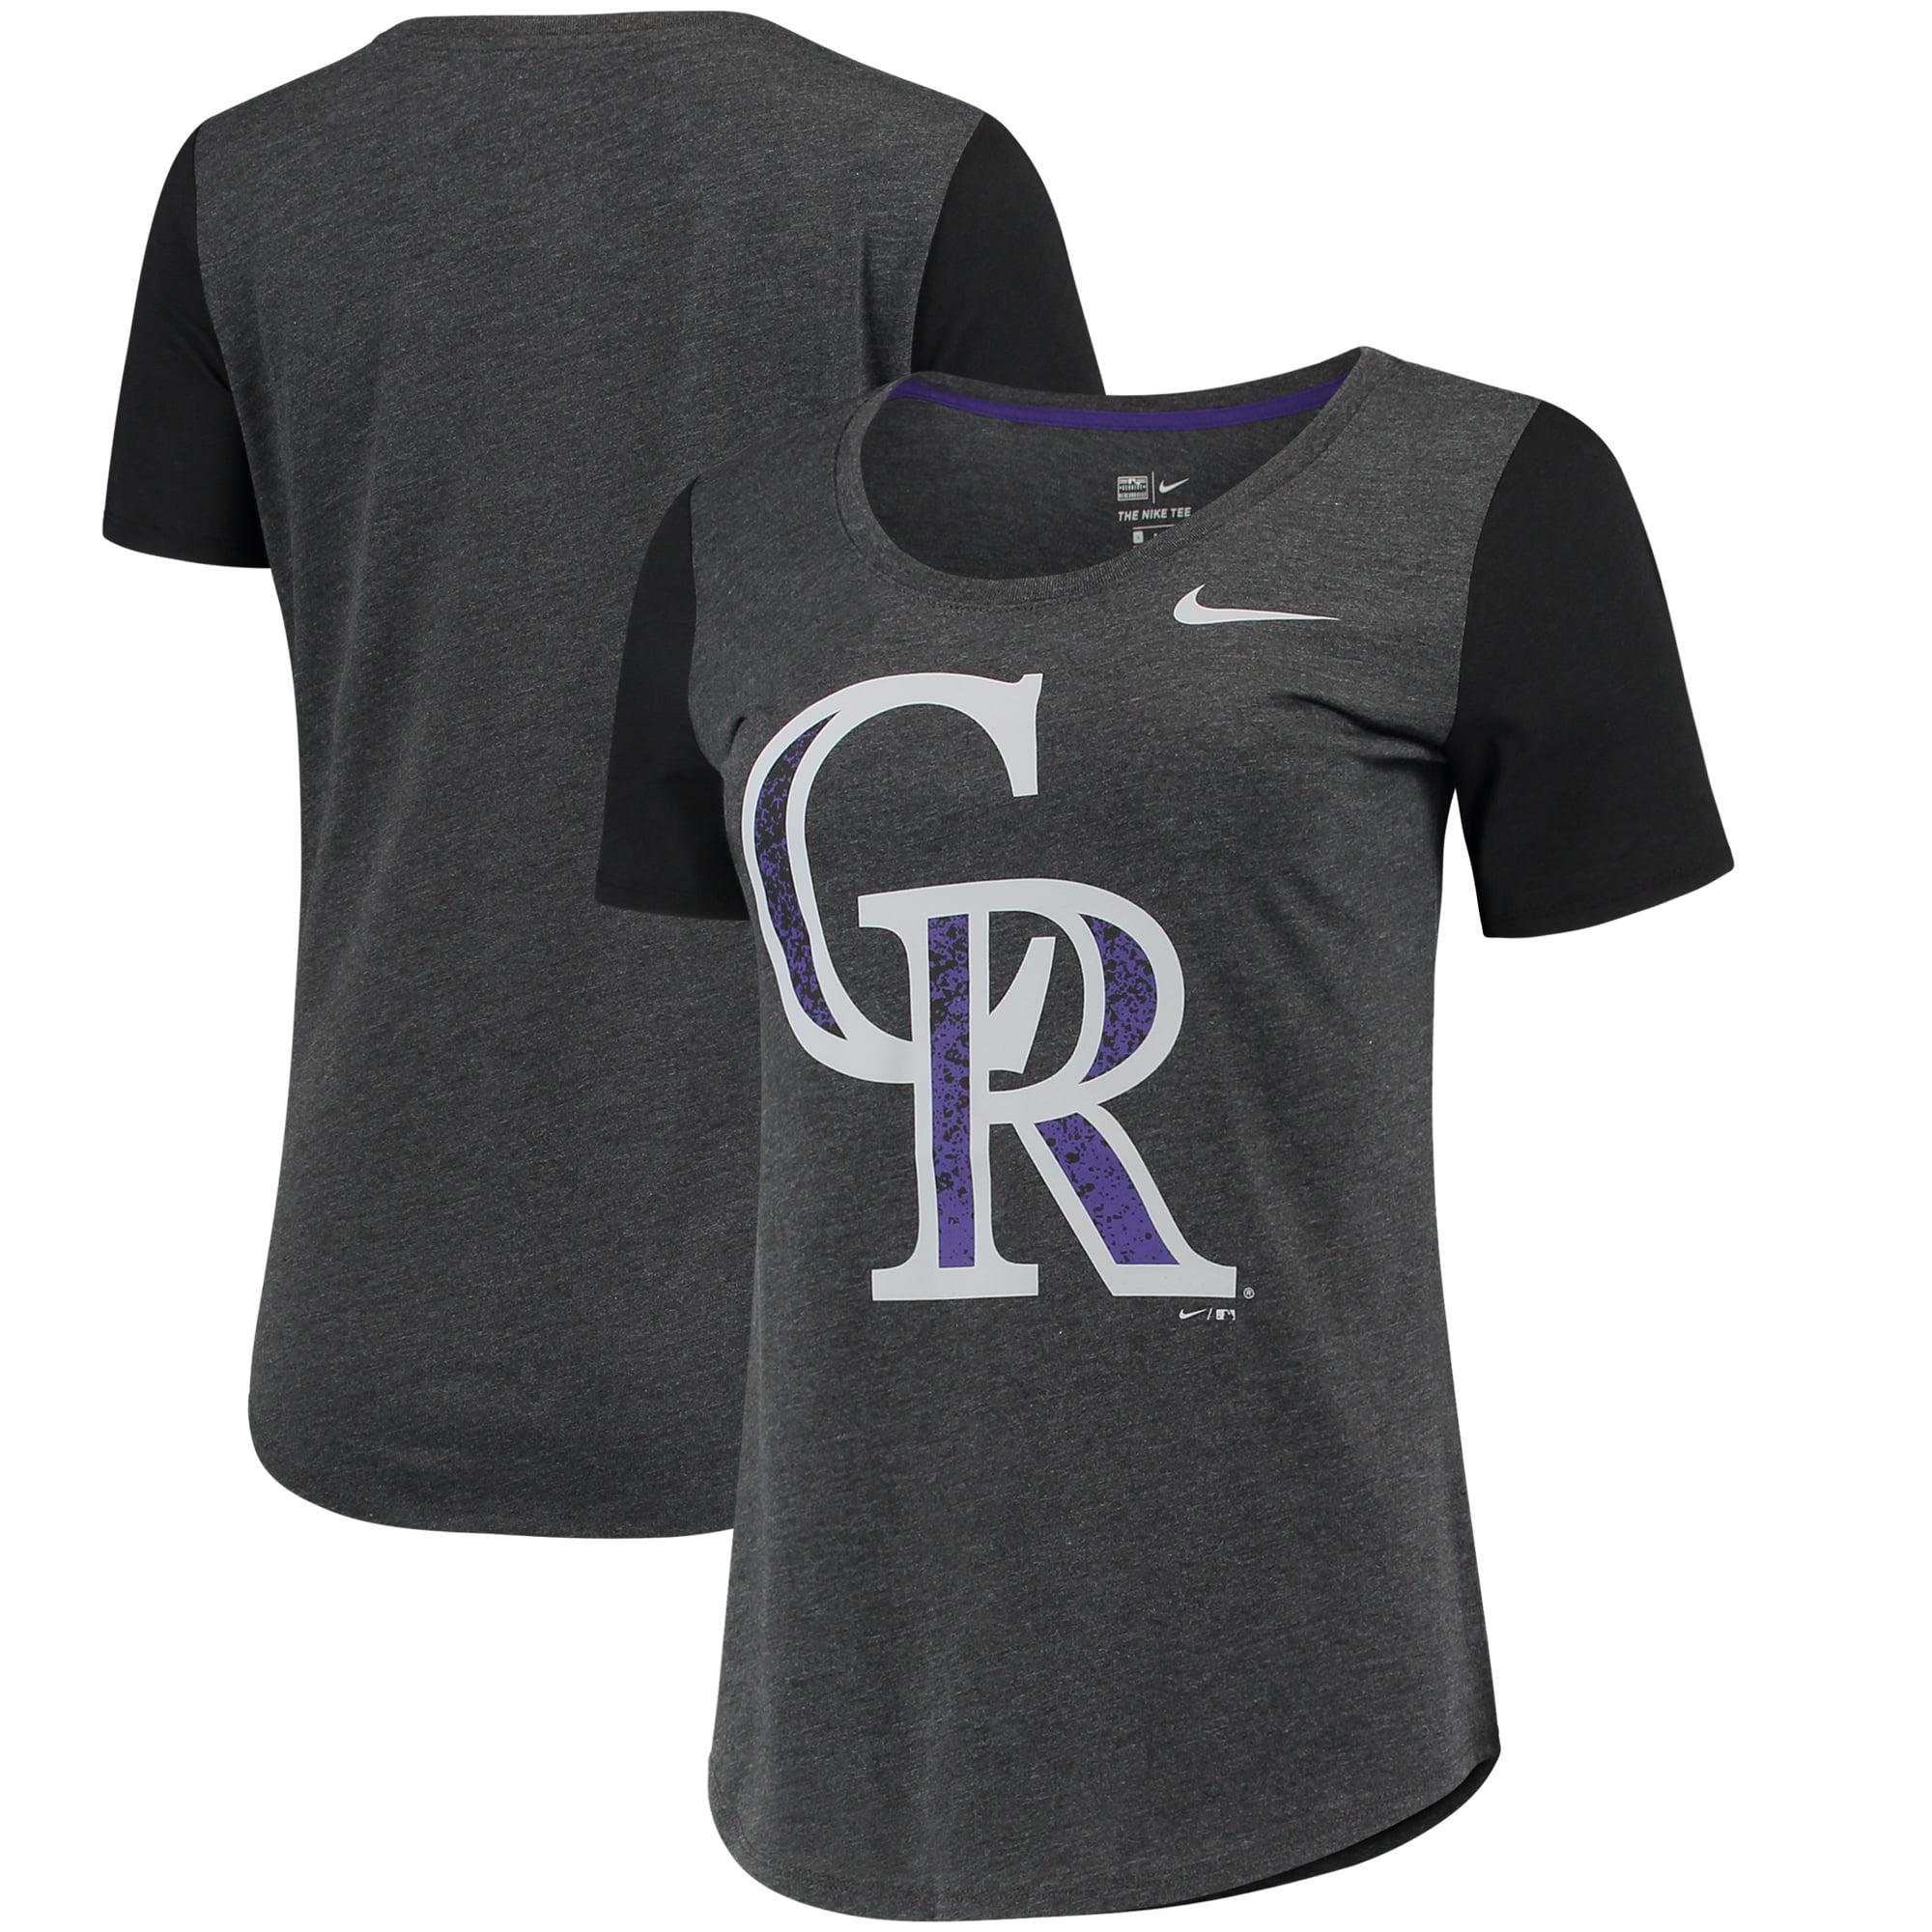 Colorado Rockies Nike Women's Tri-Blend Scoop Neck T-Shirt - Black